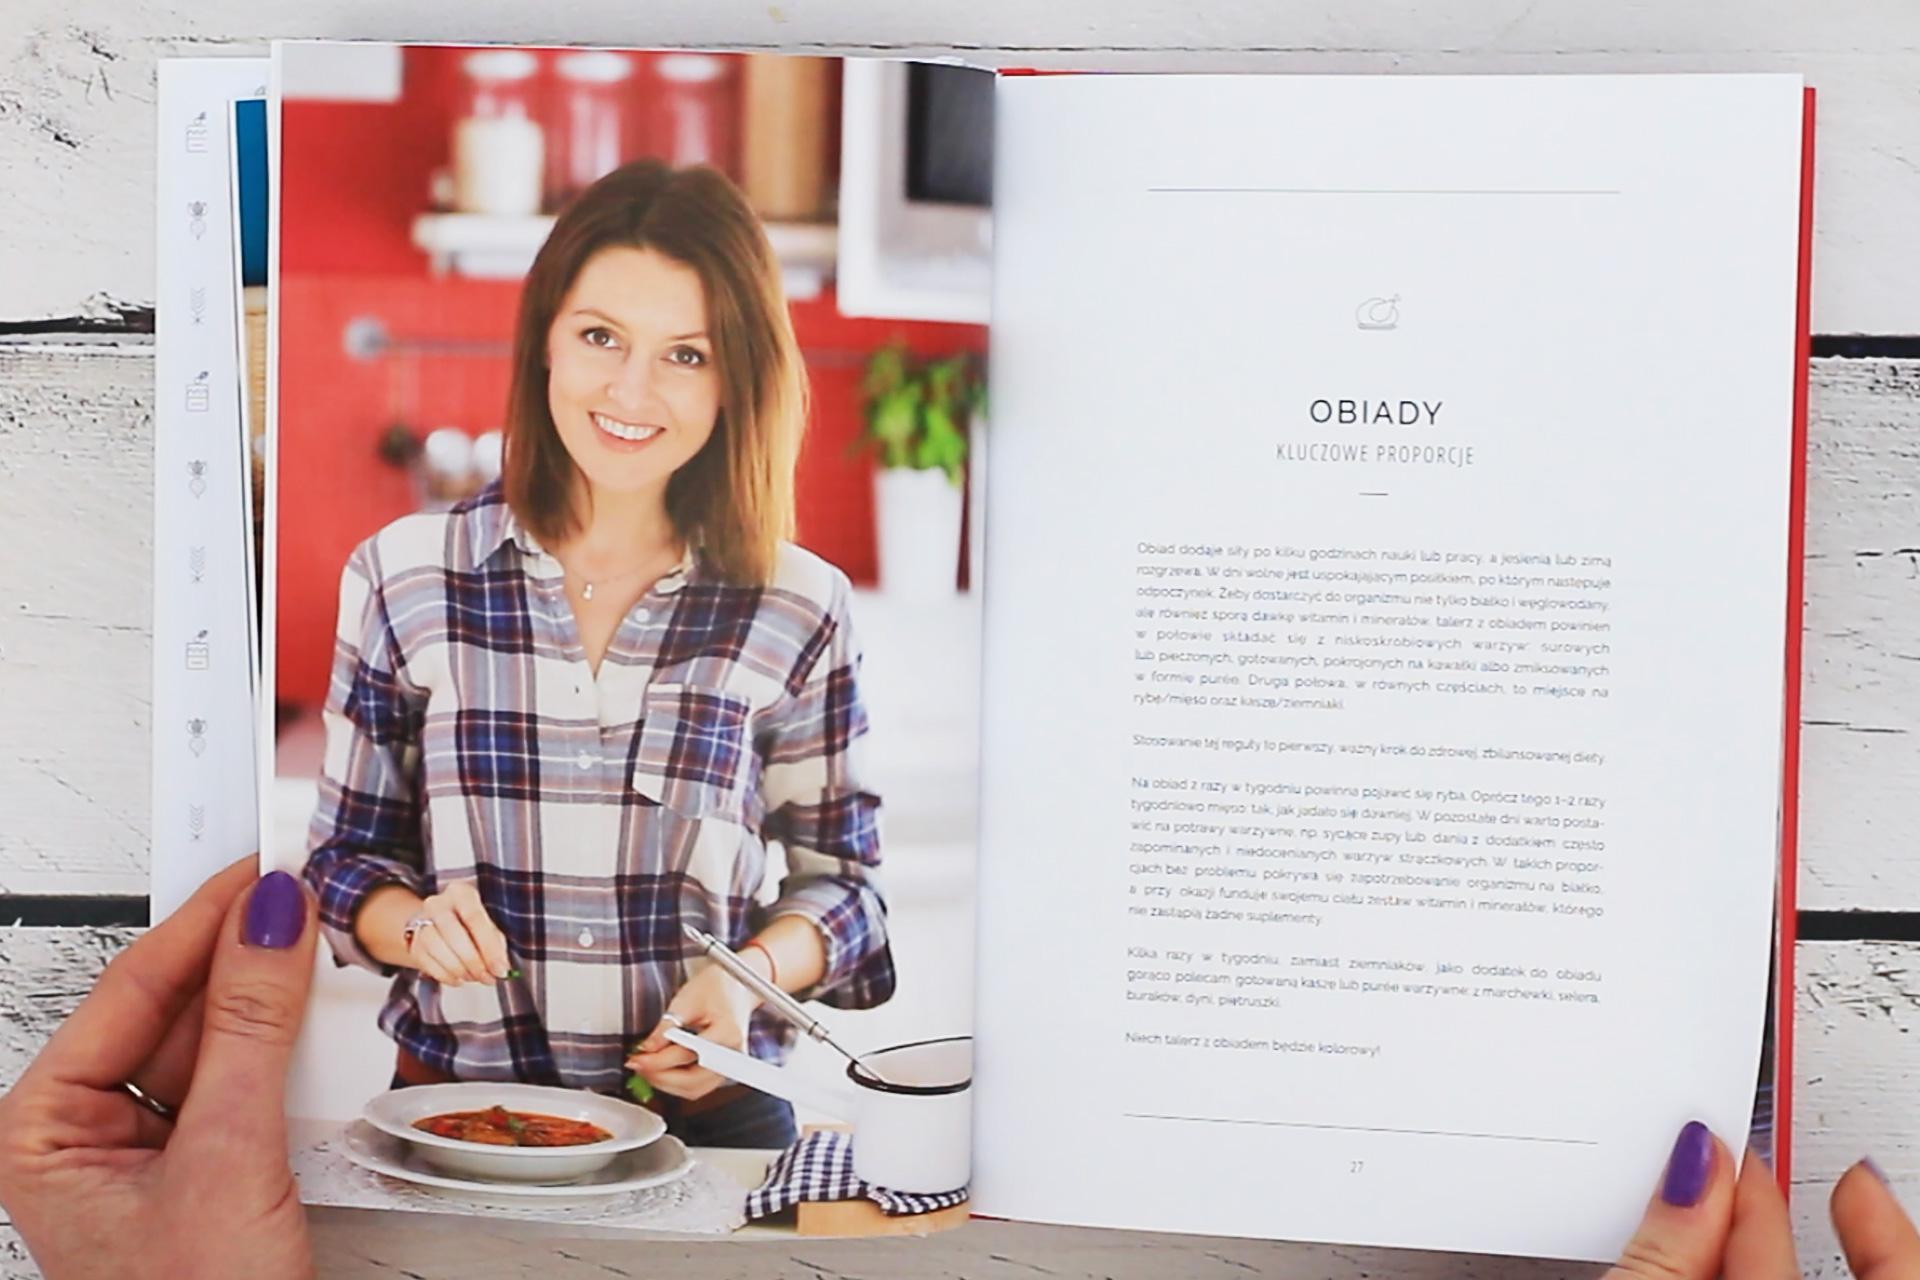 """Superfood po polsku"" - obiady"